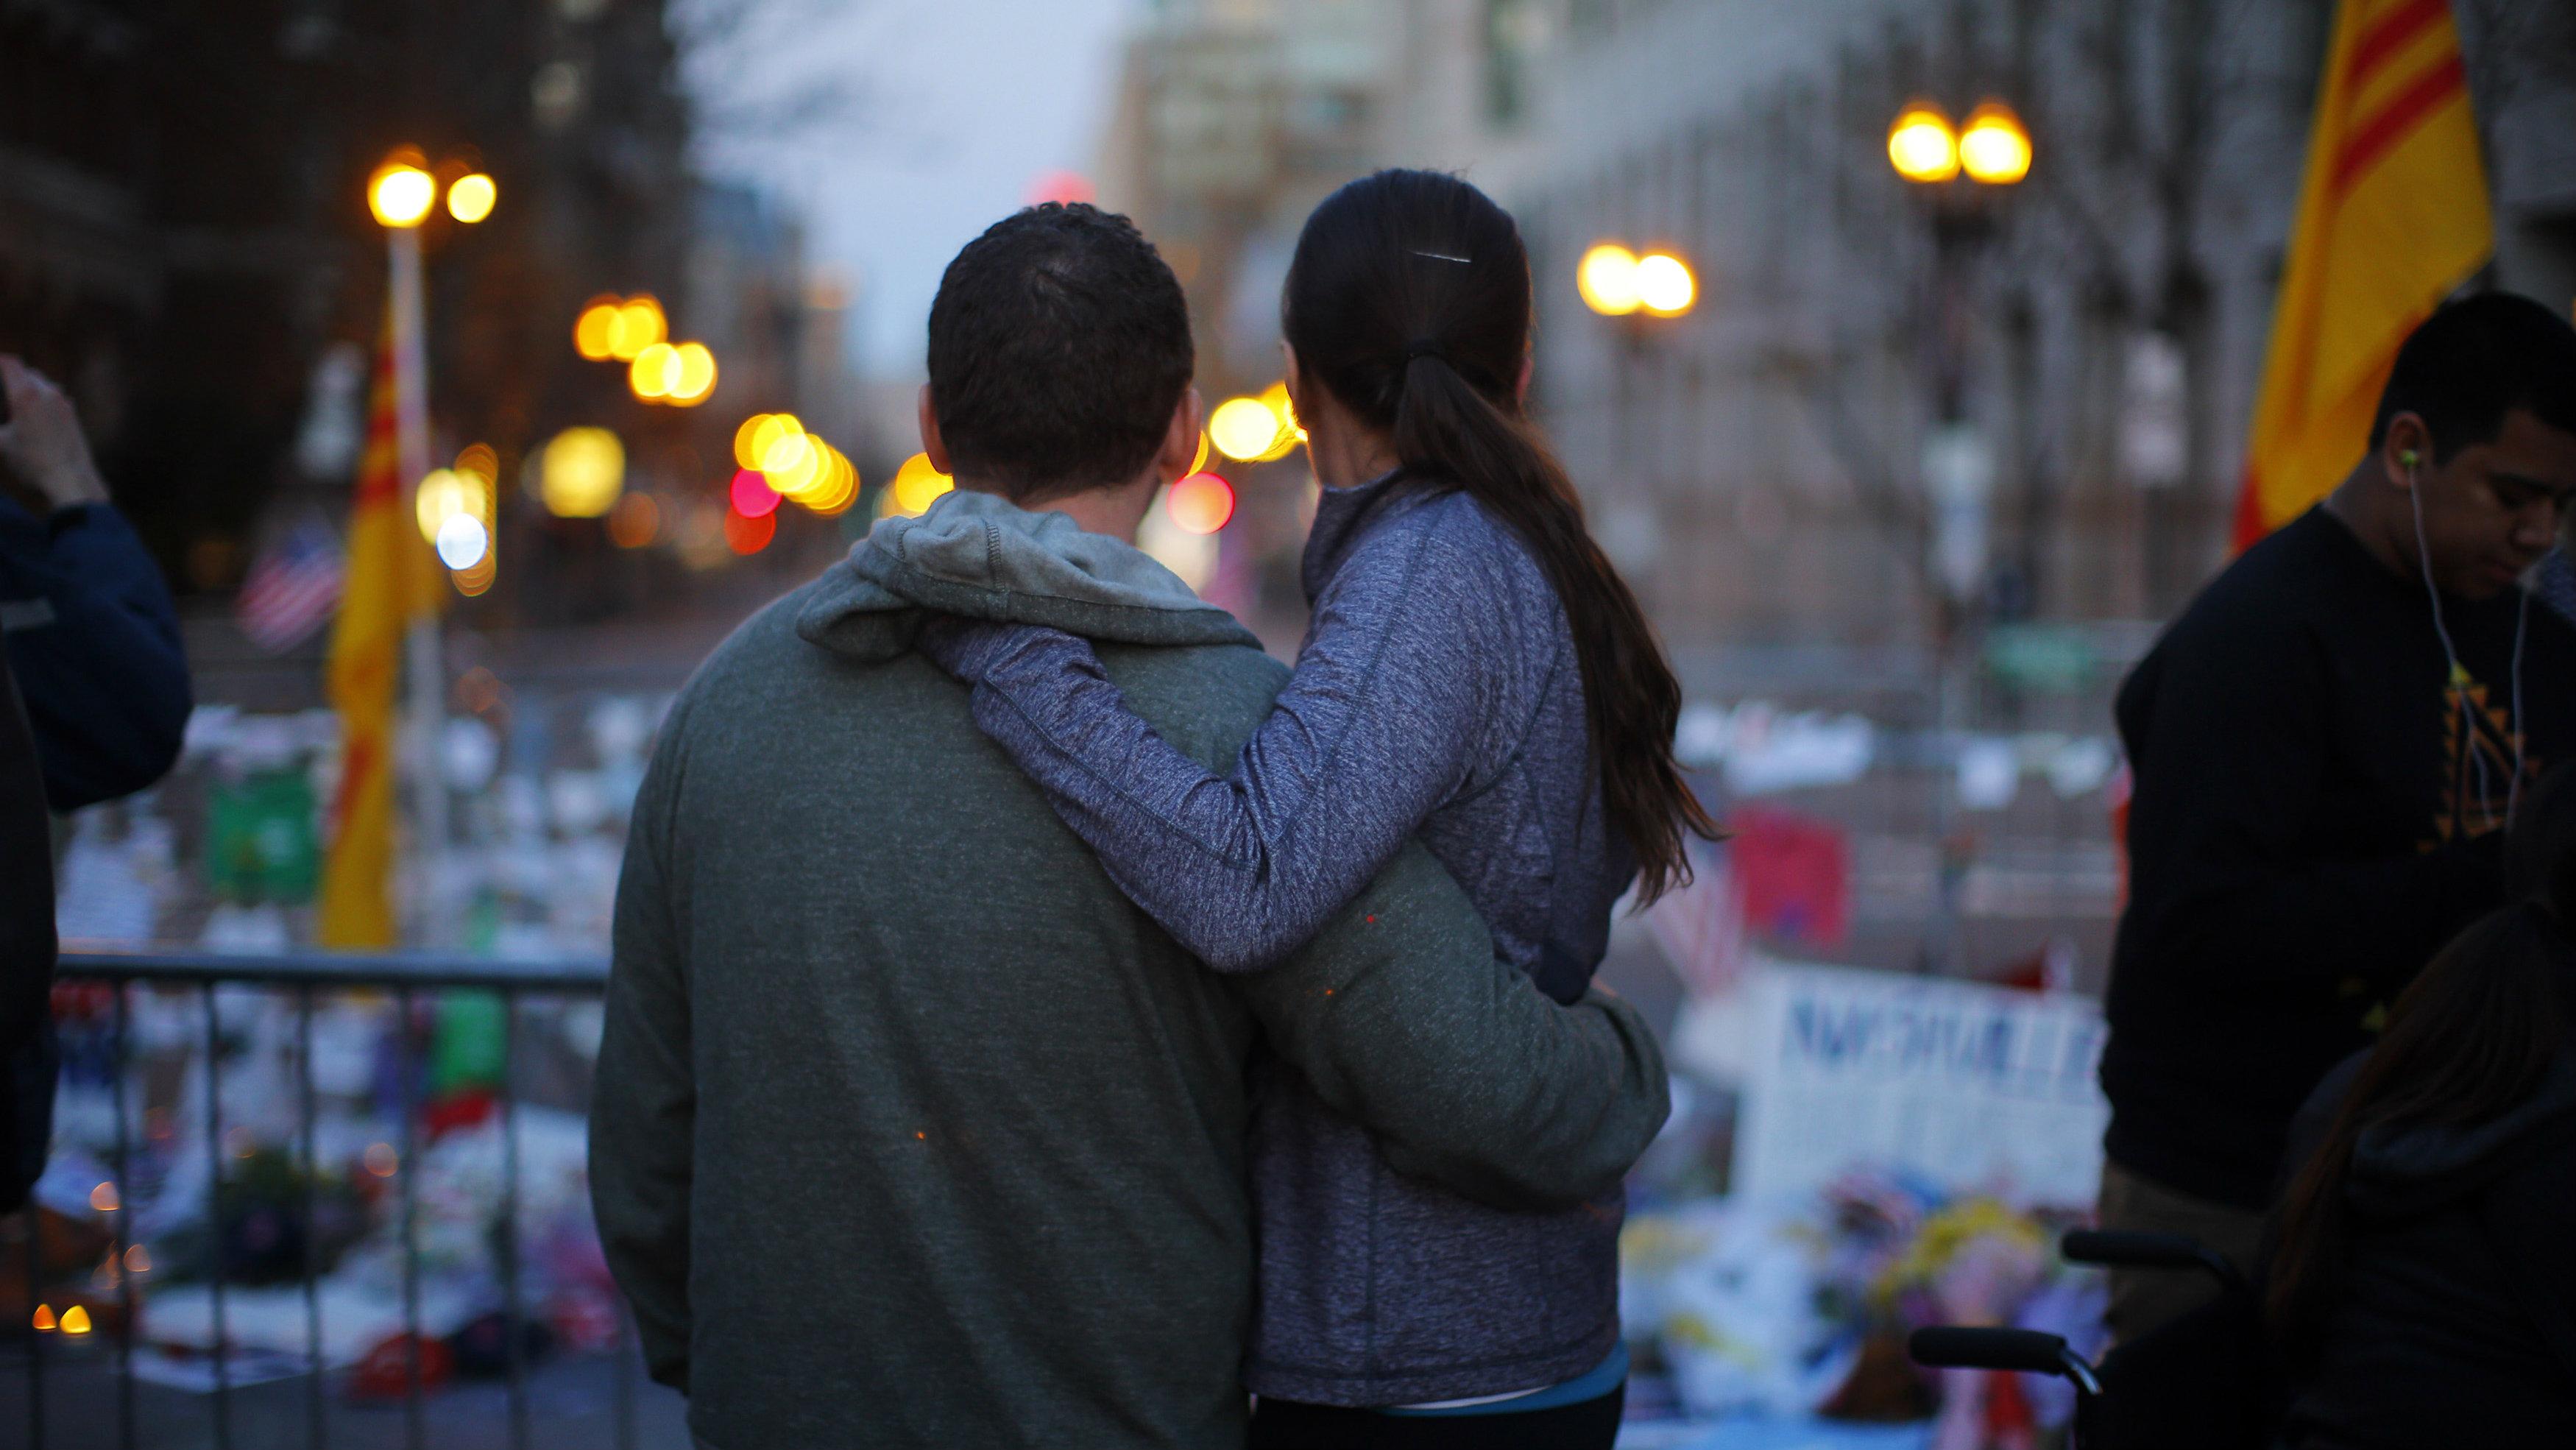 mourning at boston marathon